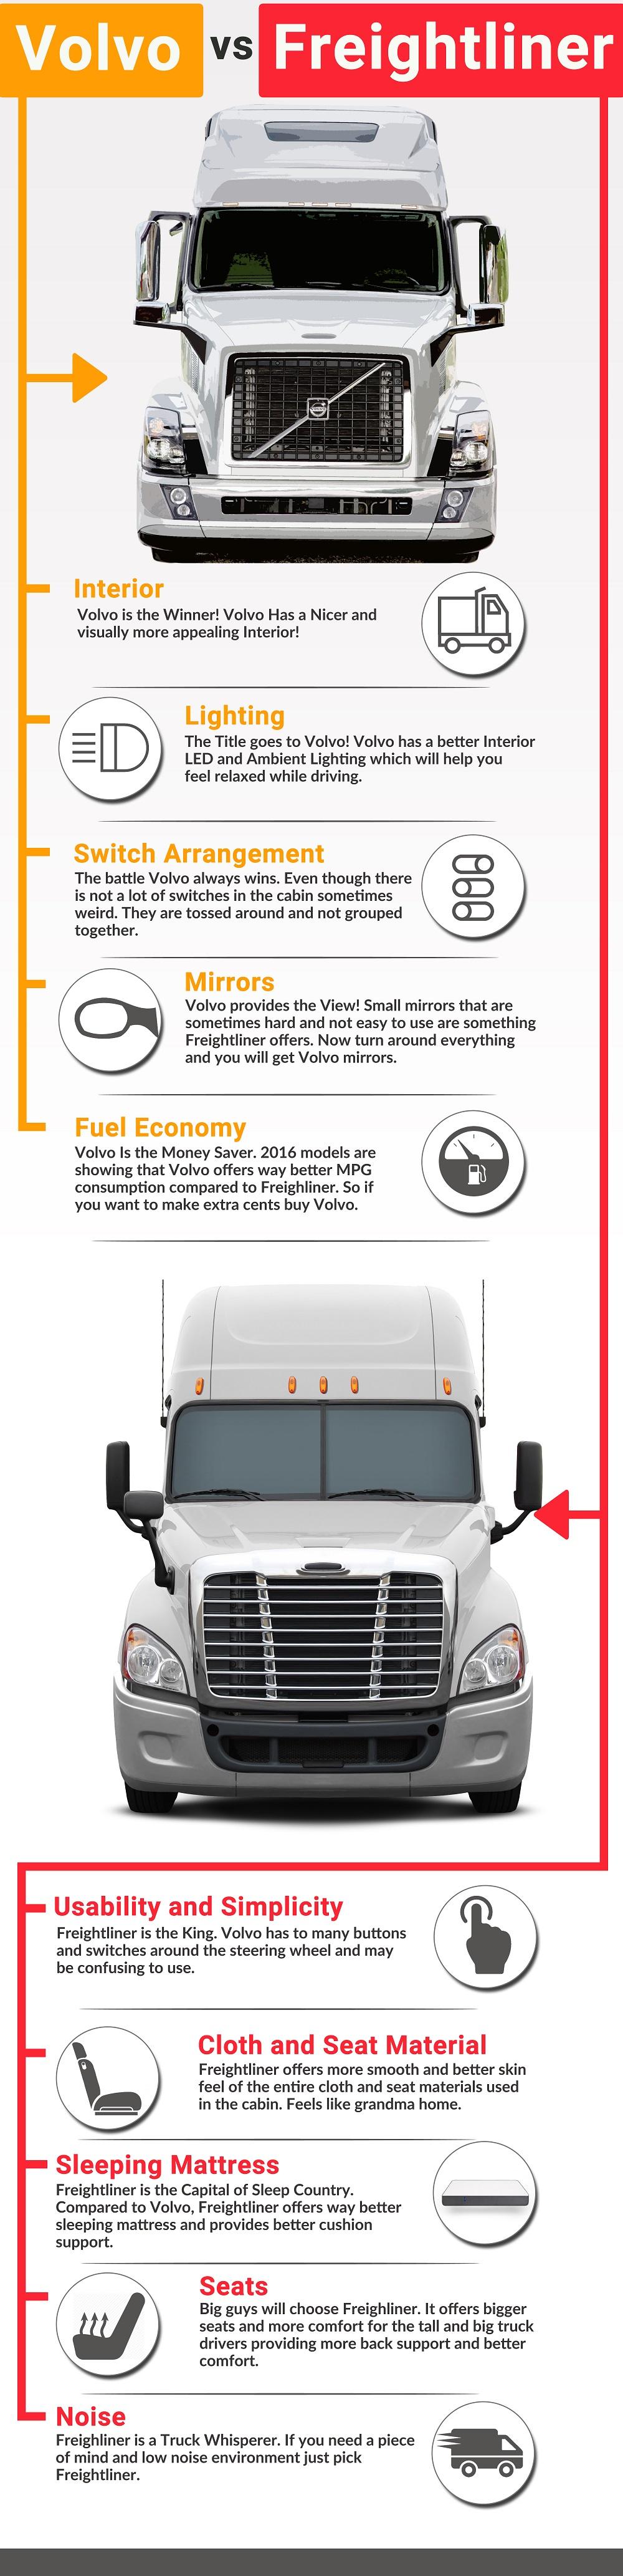 Volvo vs Freightliner